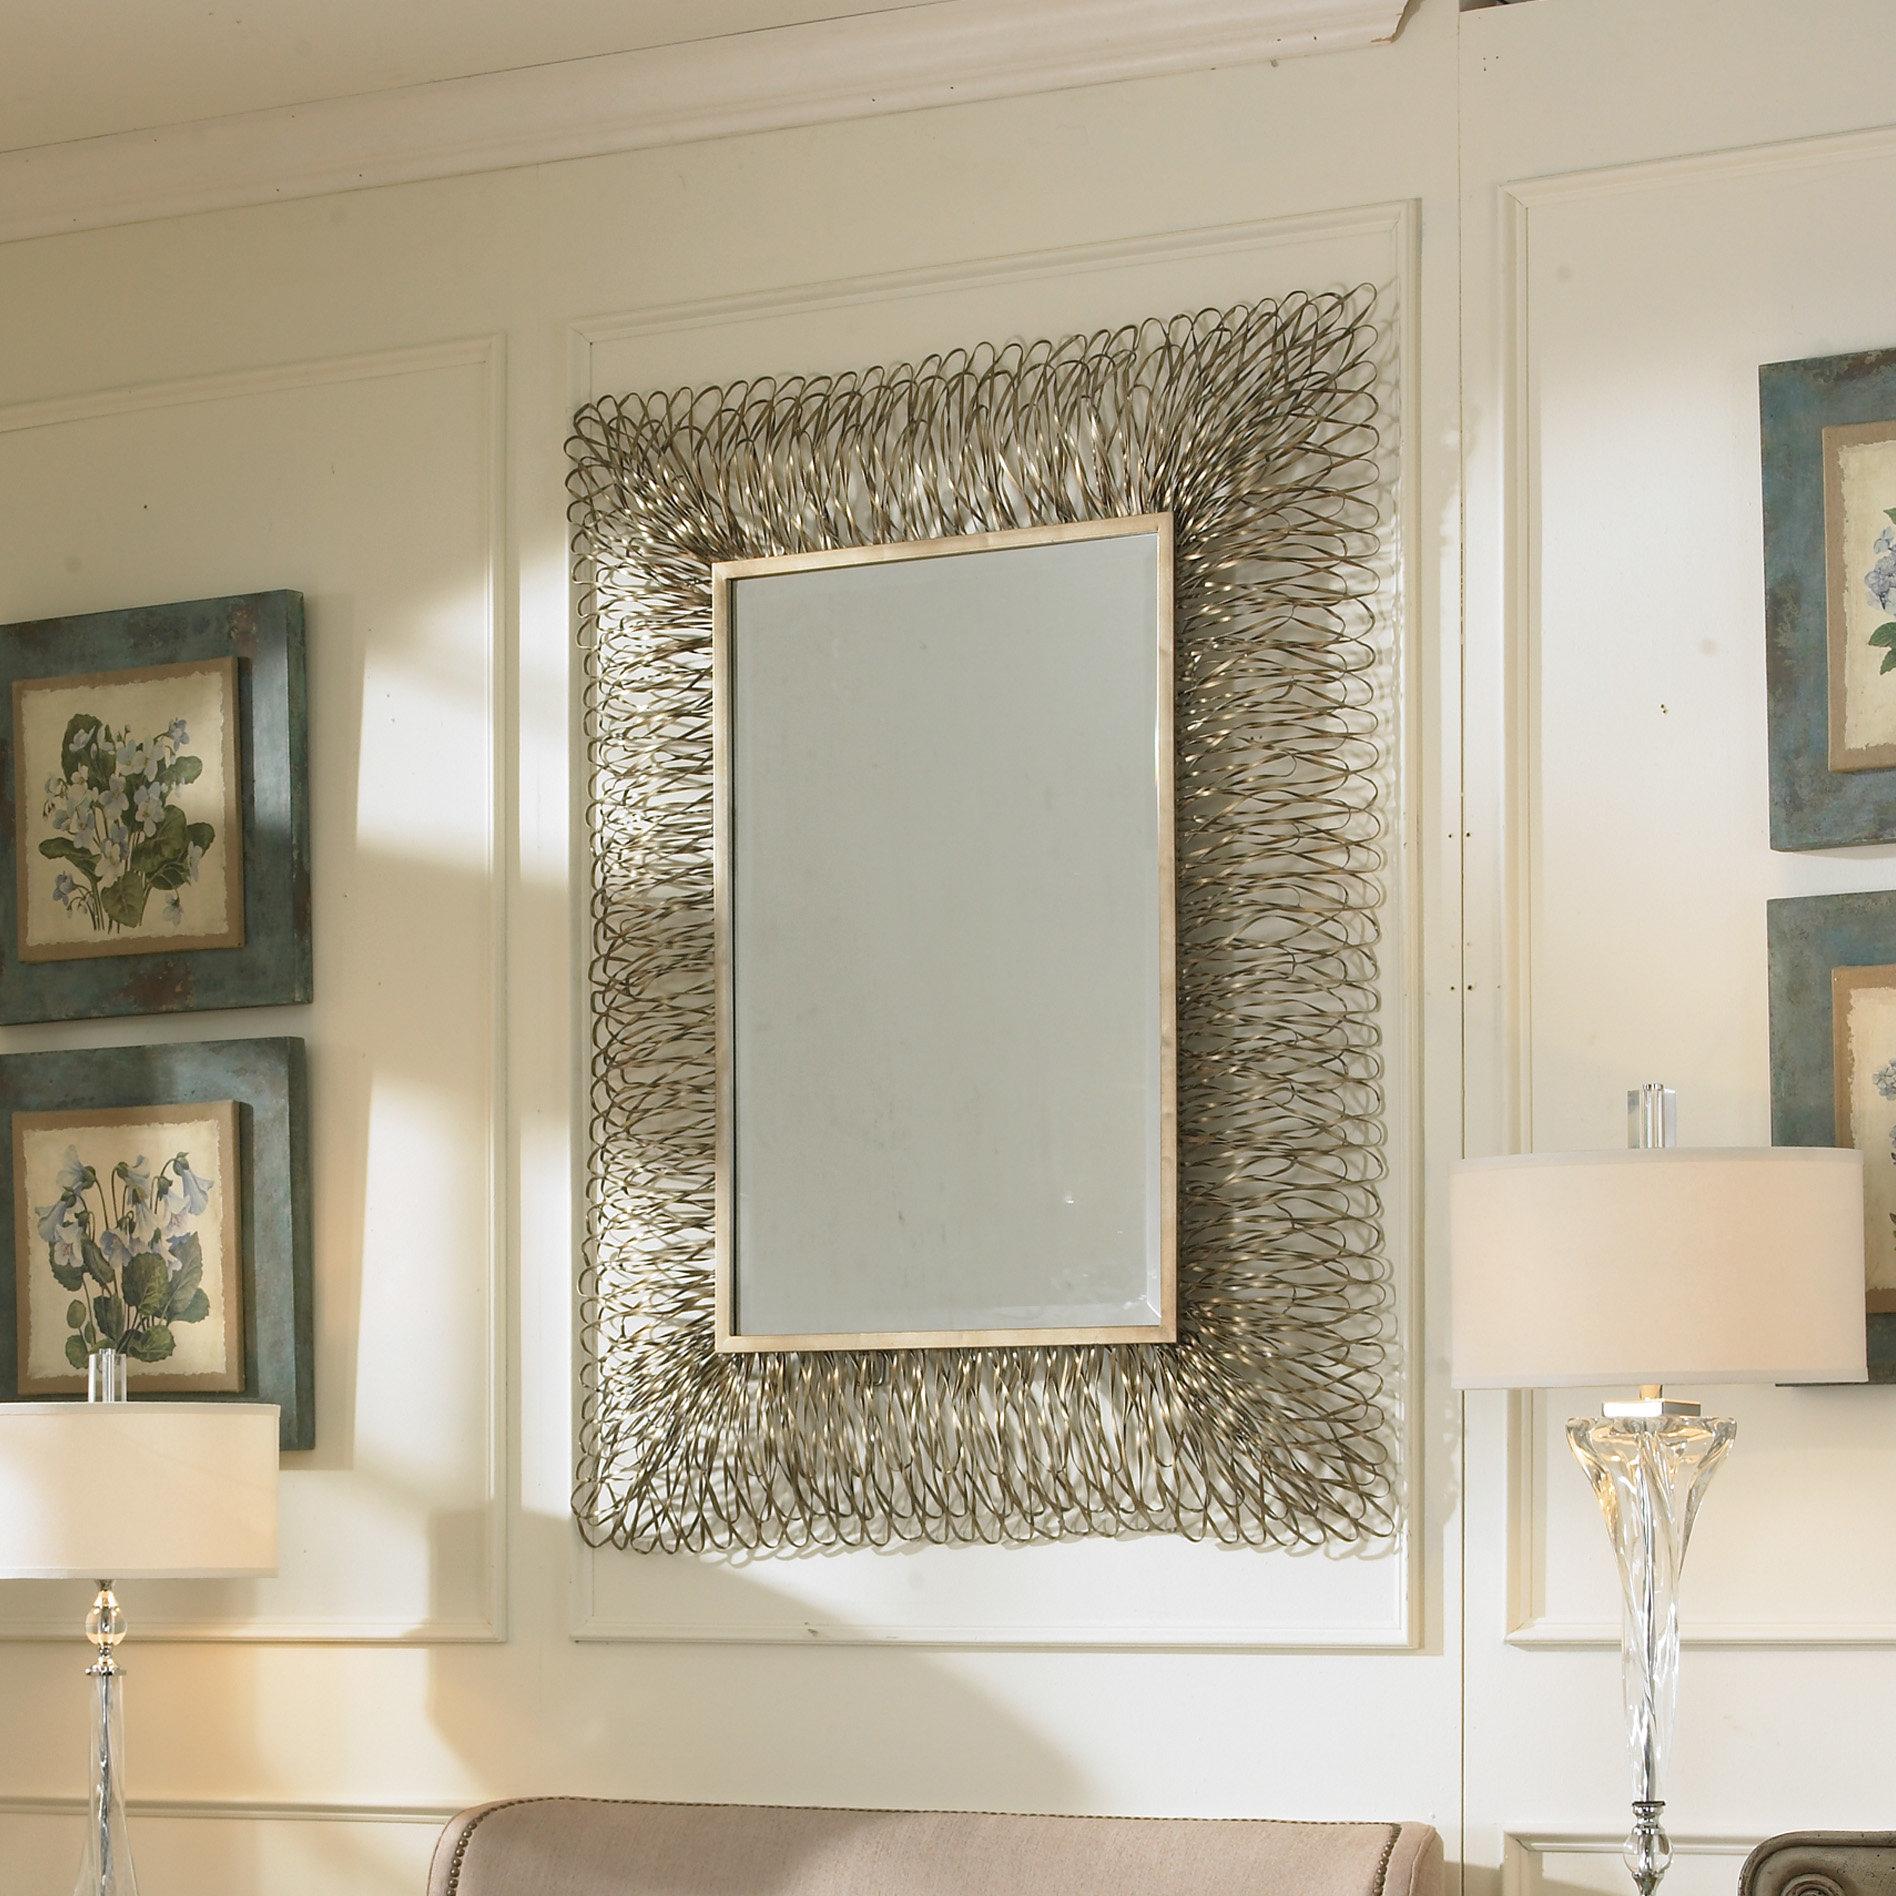 Decorative Wall Mirrors Tiles | Wayfair Throughout Bem Decorative Wall Mirrors (View 11 of 20)